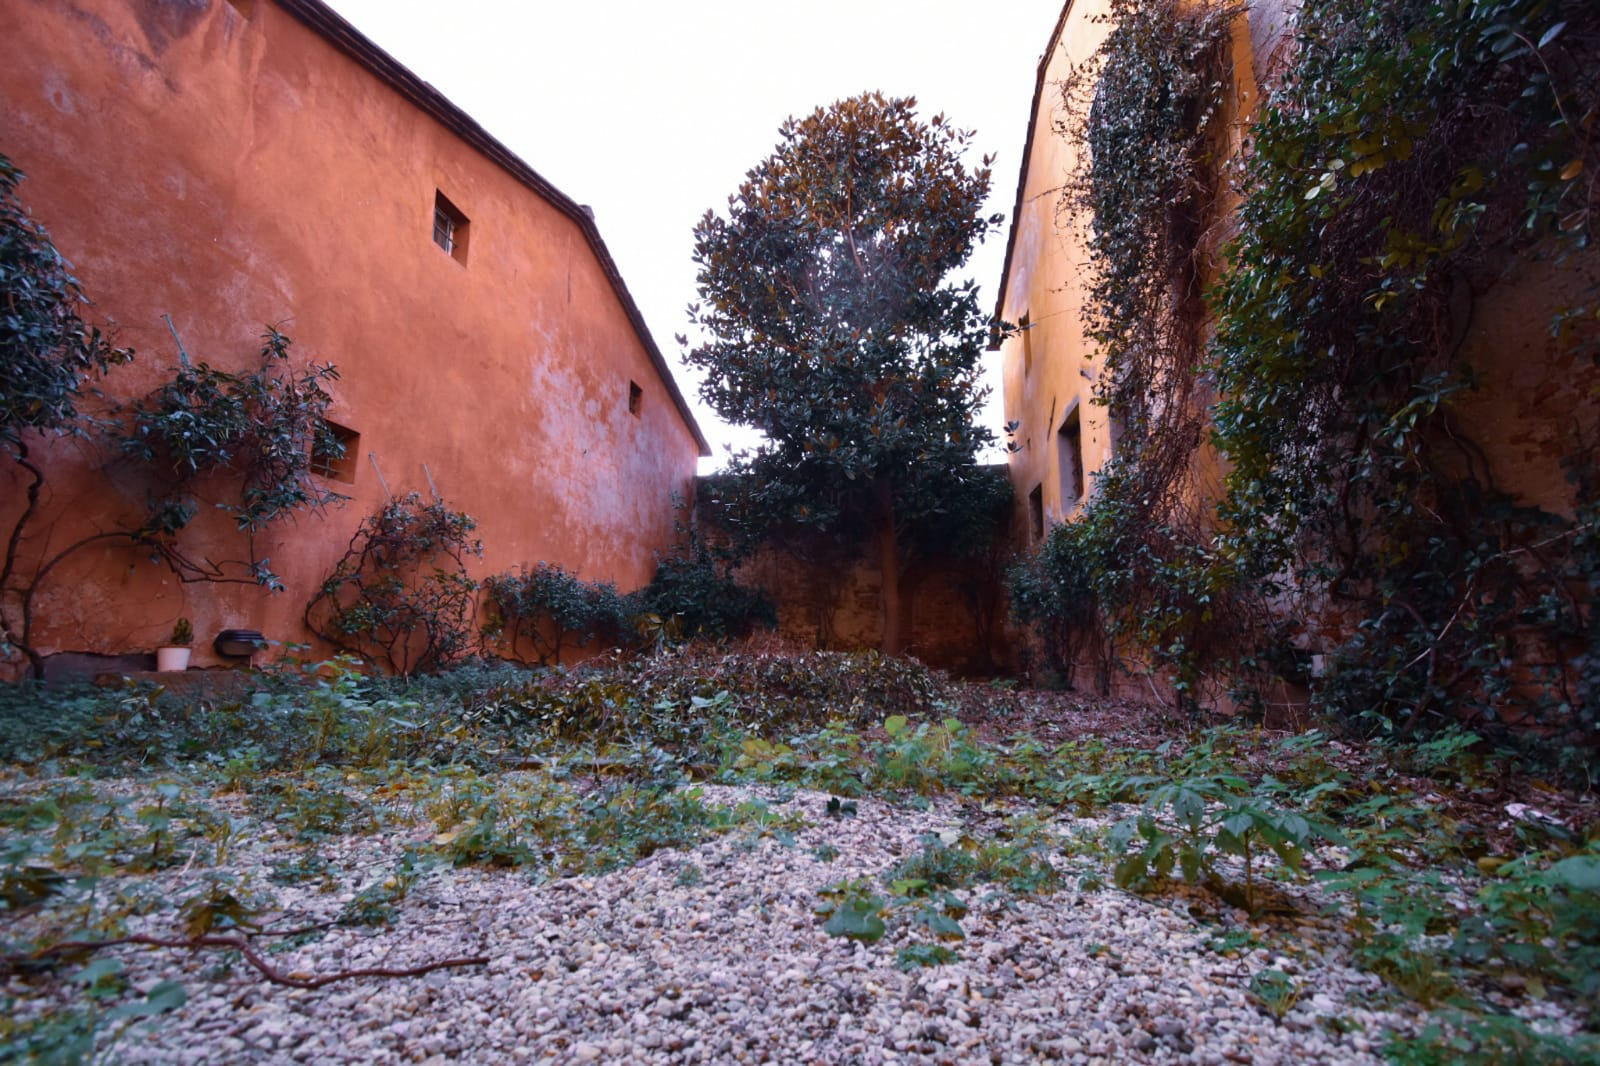 Appartamento con giardino in Via Santa Maria